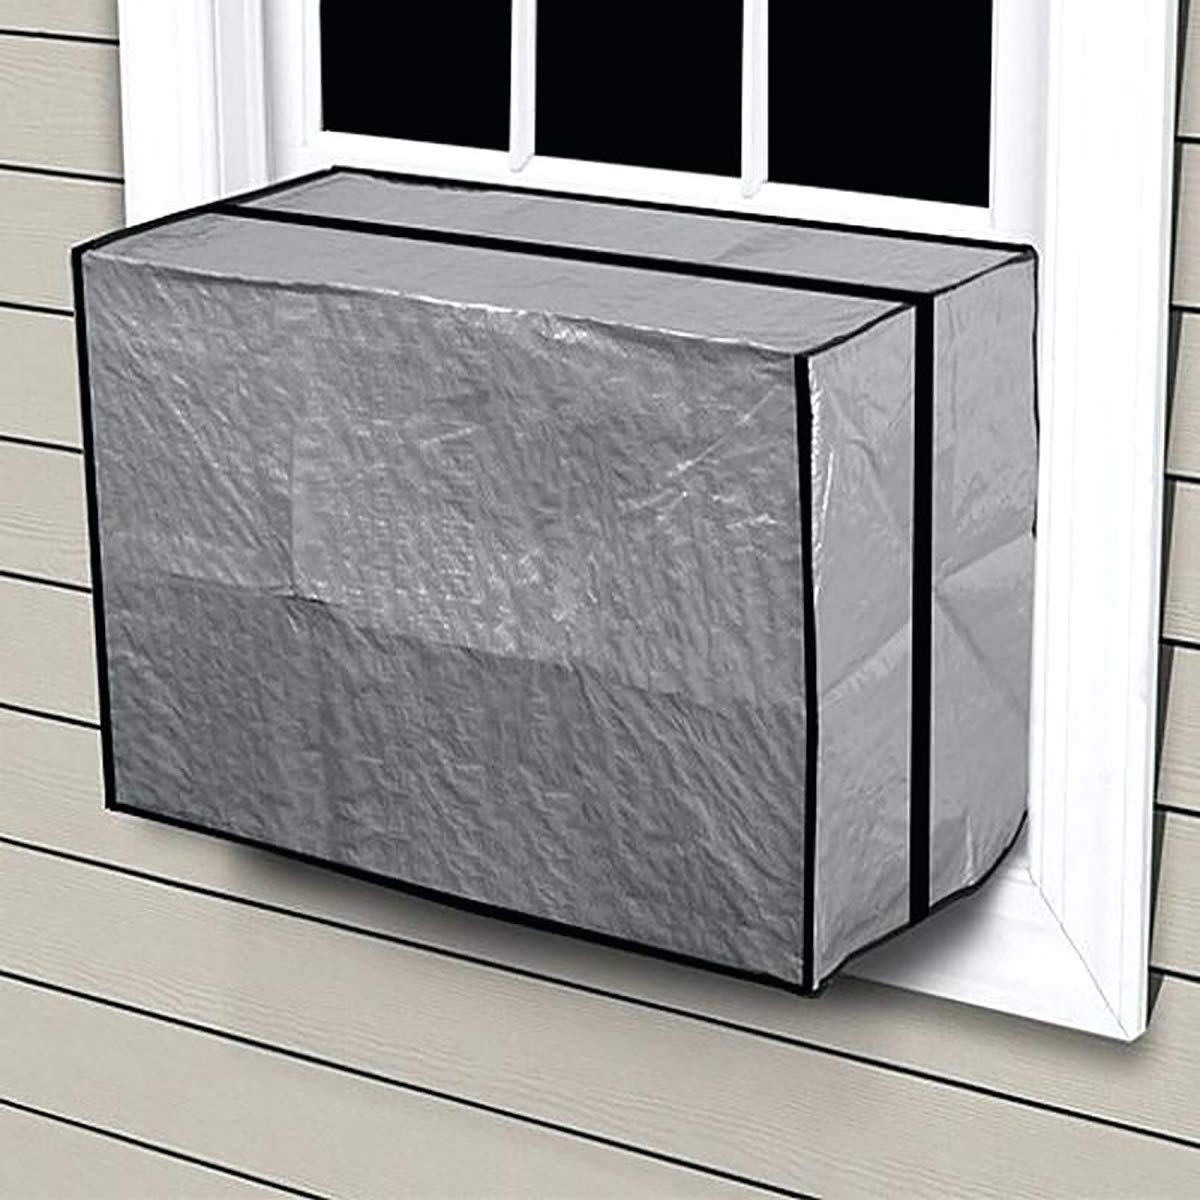 Amazon.com: Air Conditioner Heavy Duty AC Outdoor Window Unit Cover Medium 10,000-15,000 BTU: Home \u0026 Kitchen